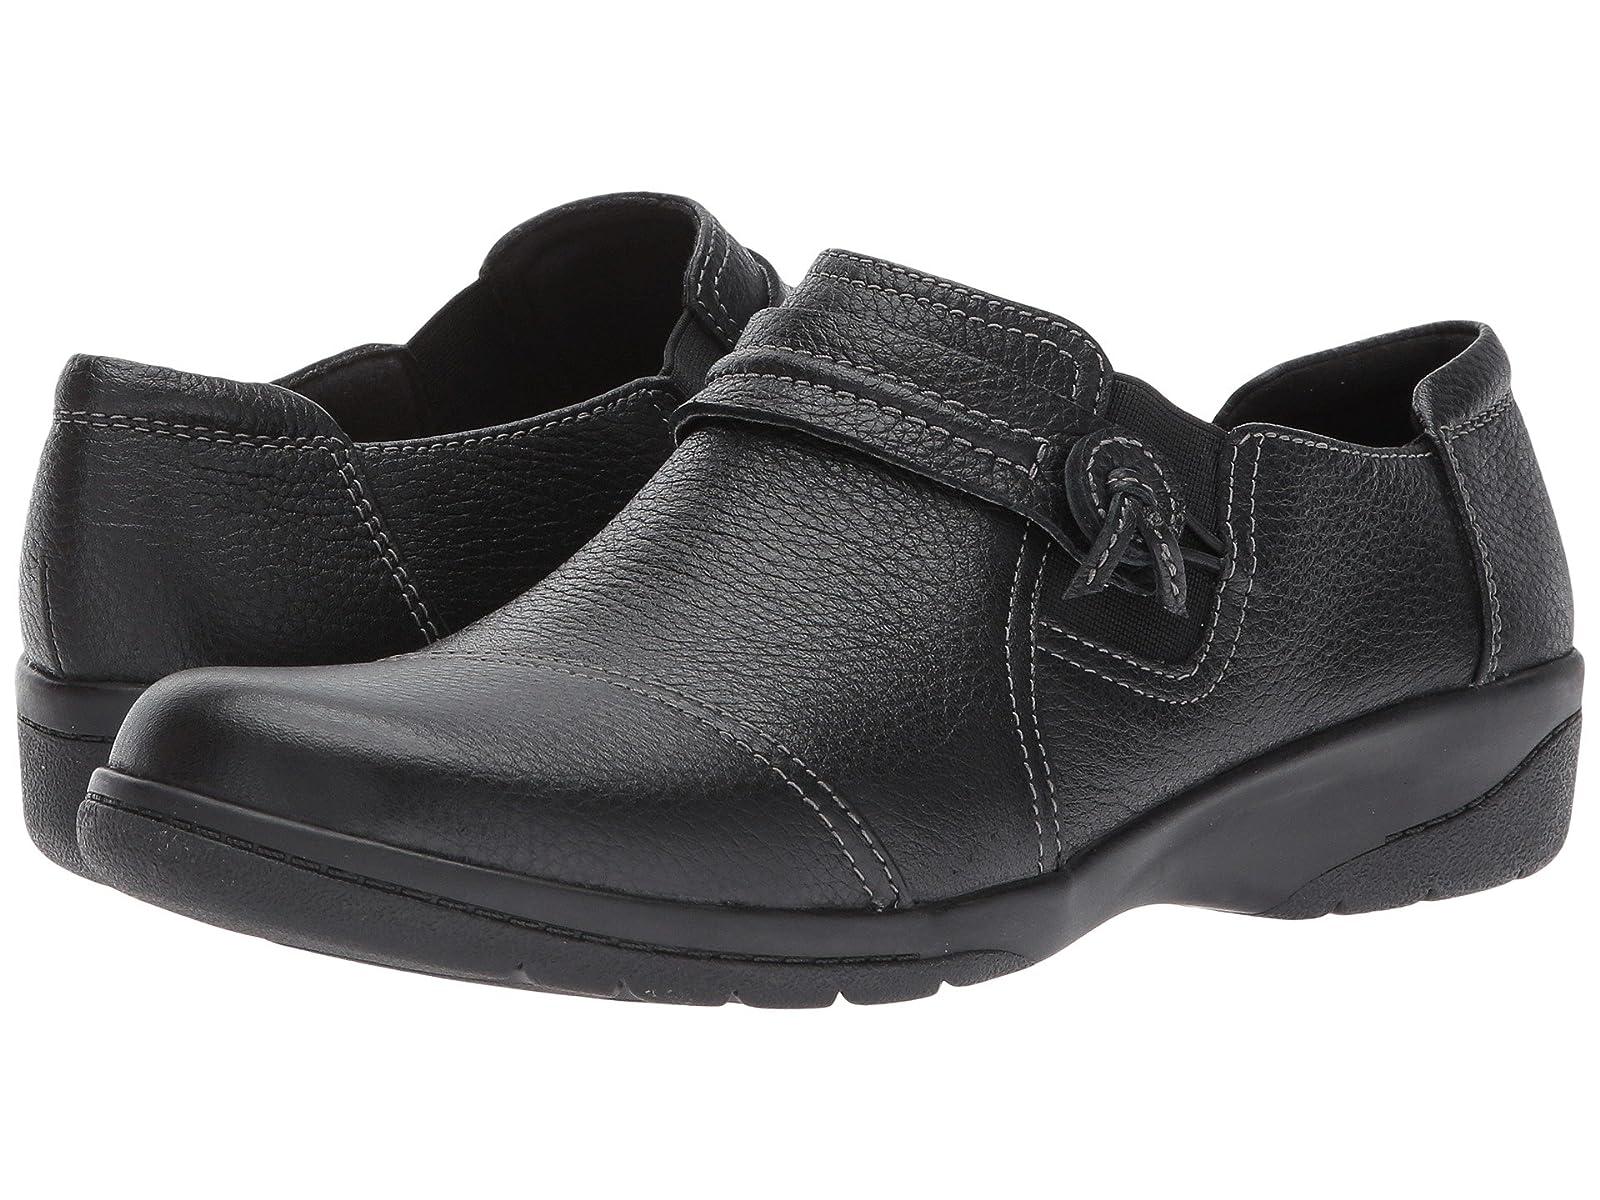 Clarks Cheyn MadiCheap and distinctive eye-catching shoes